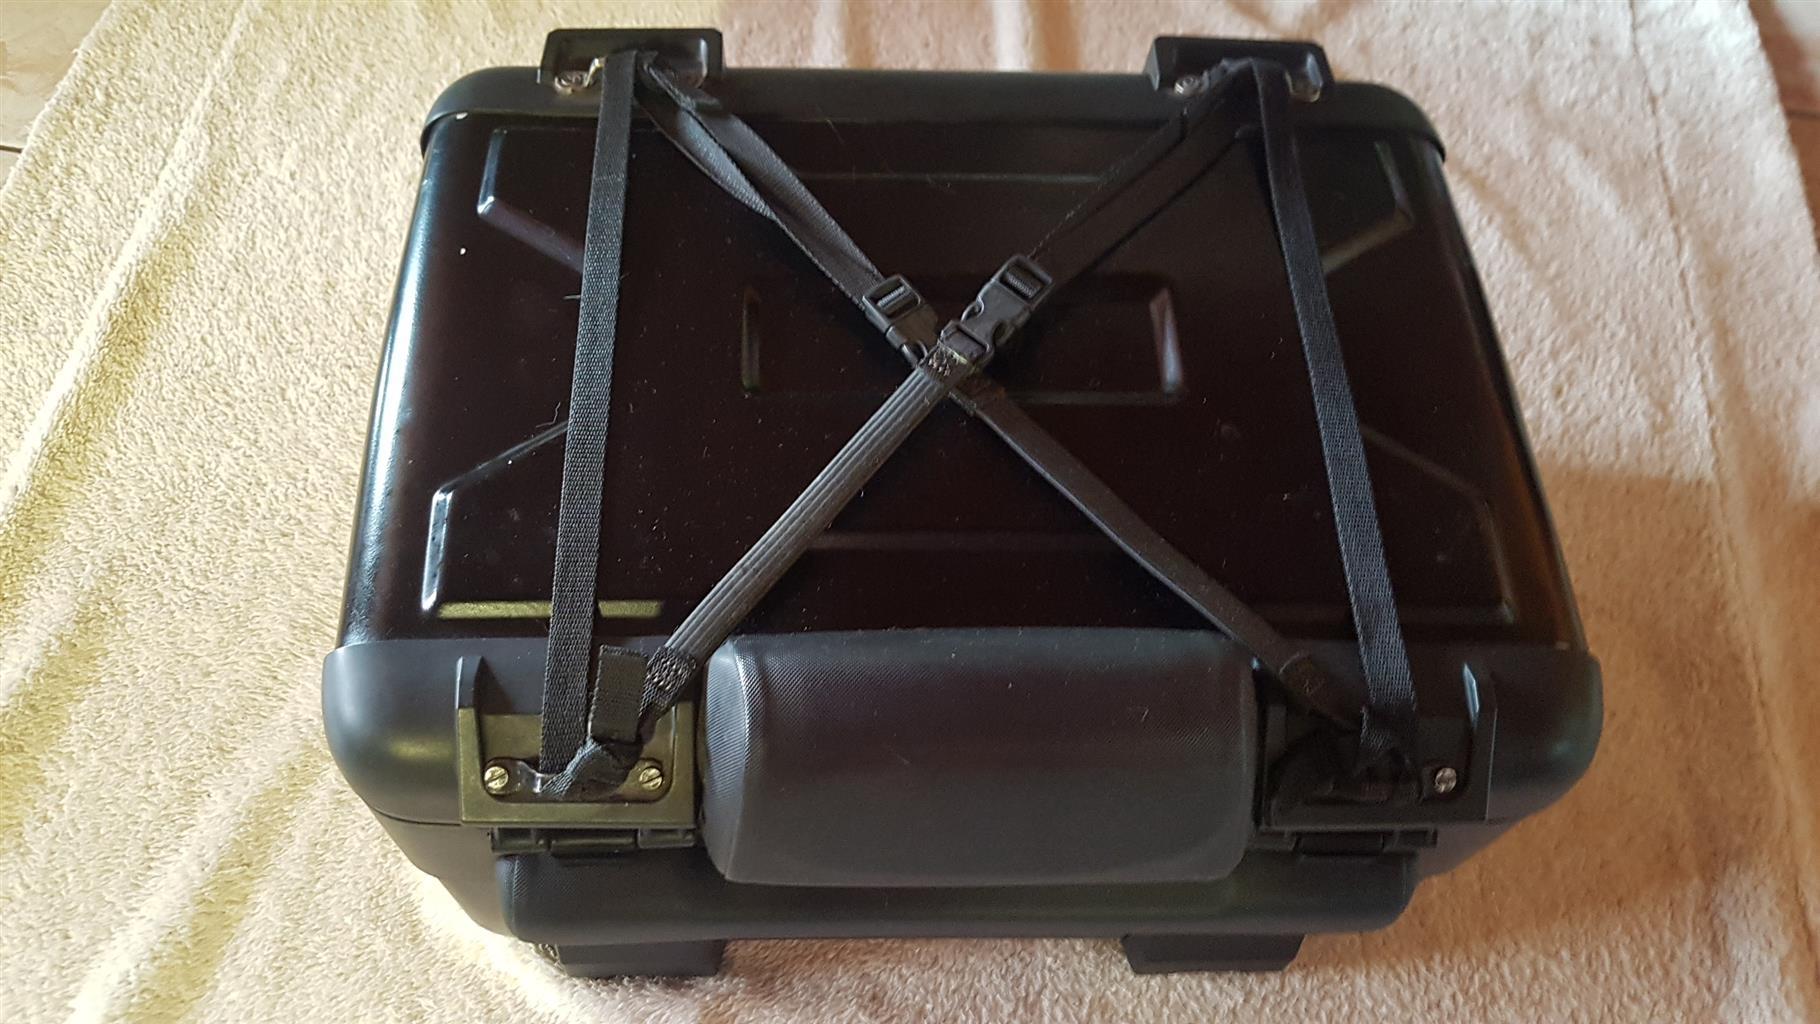 BMW Top Box and Bracket